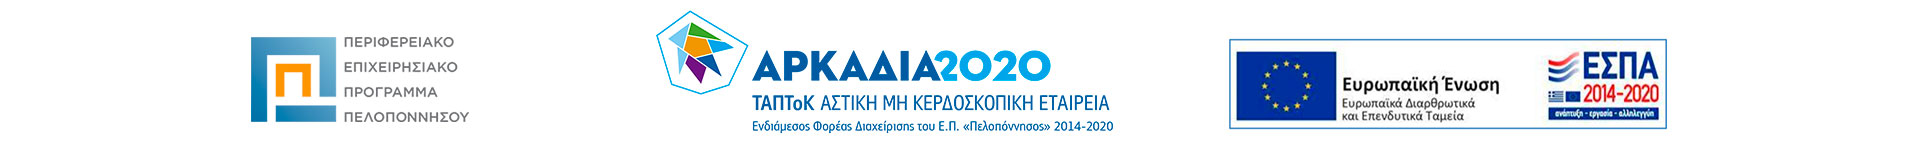 Arkadia2020 Λογότυπο